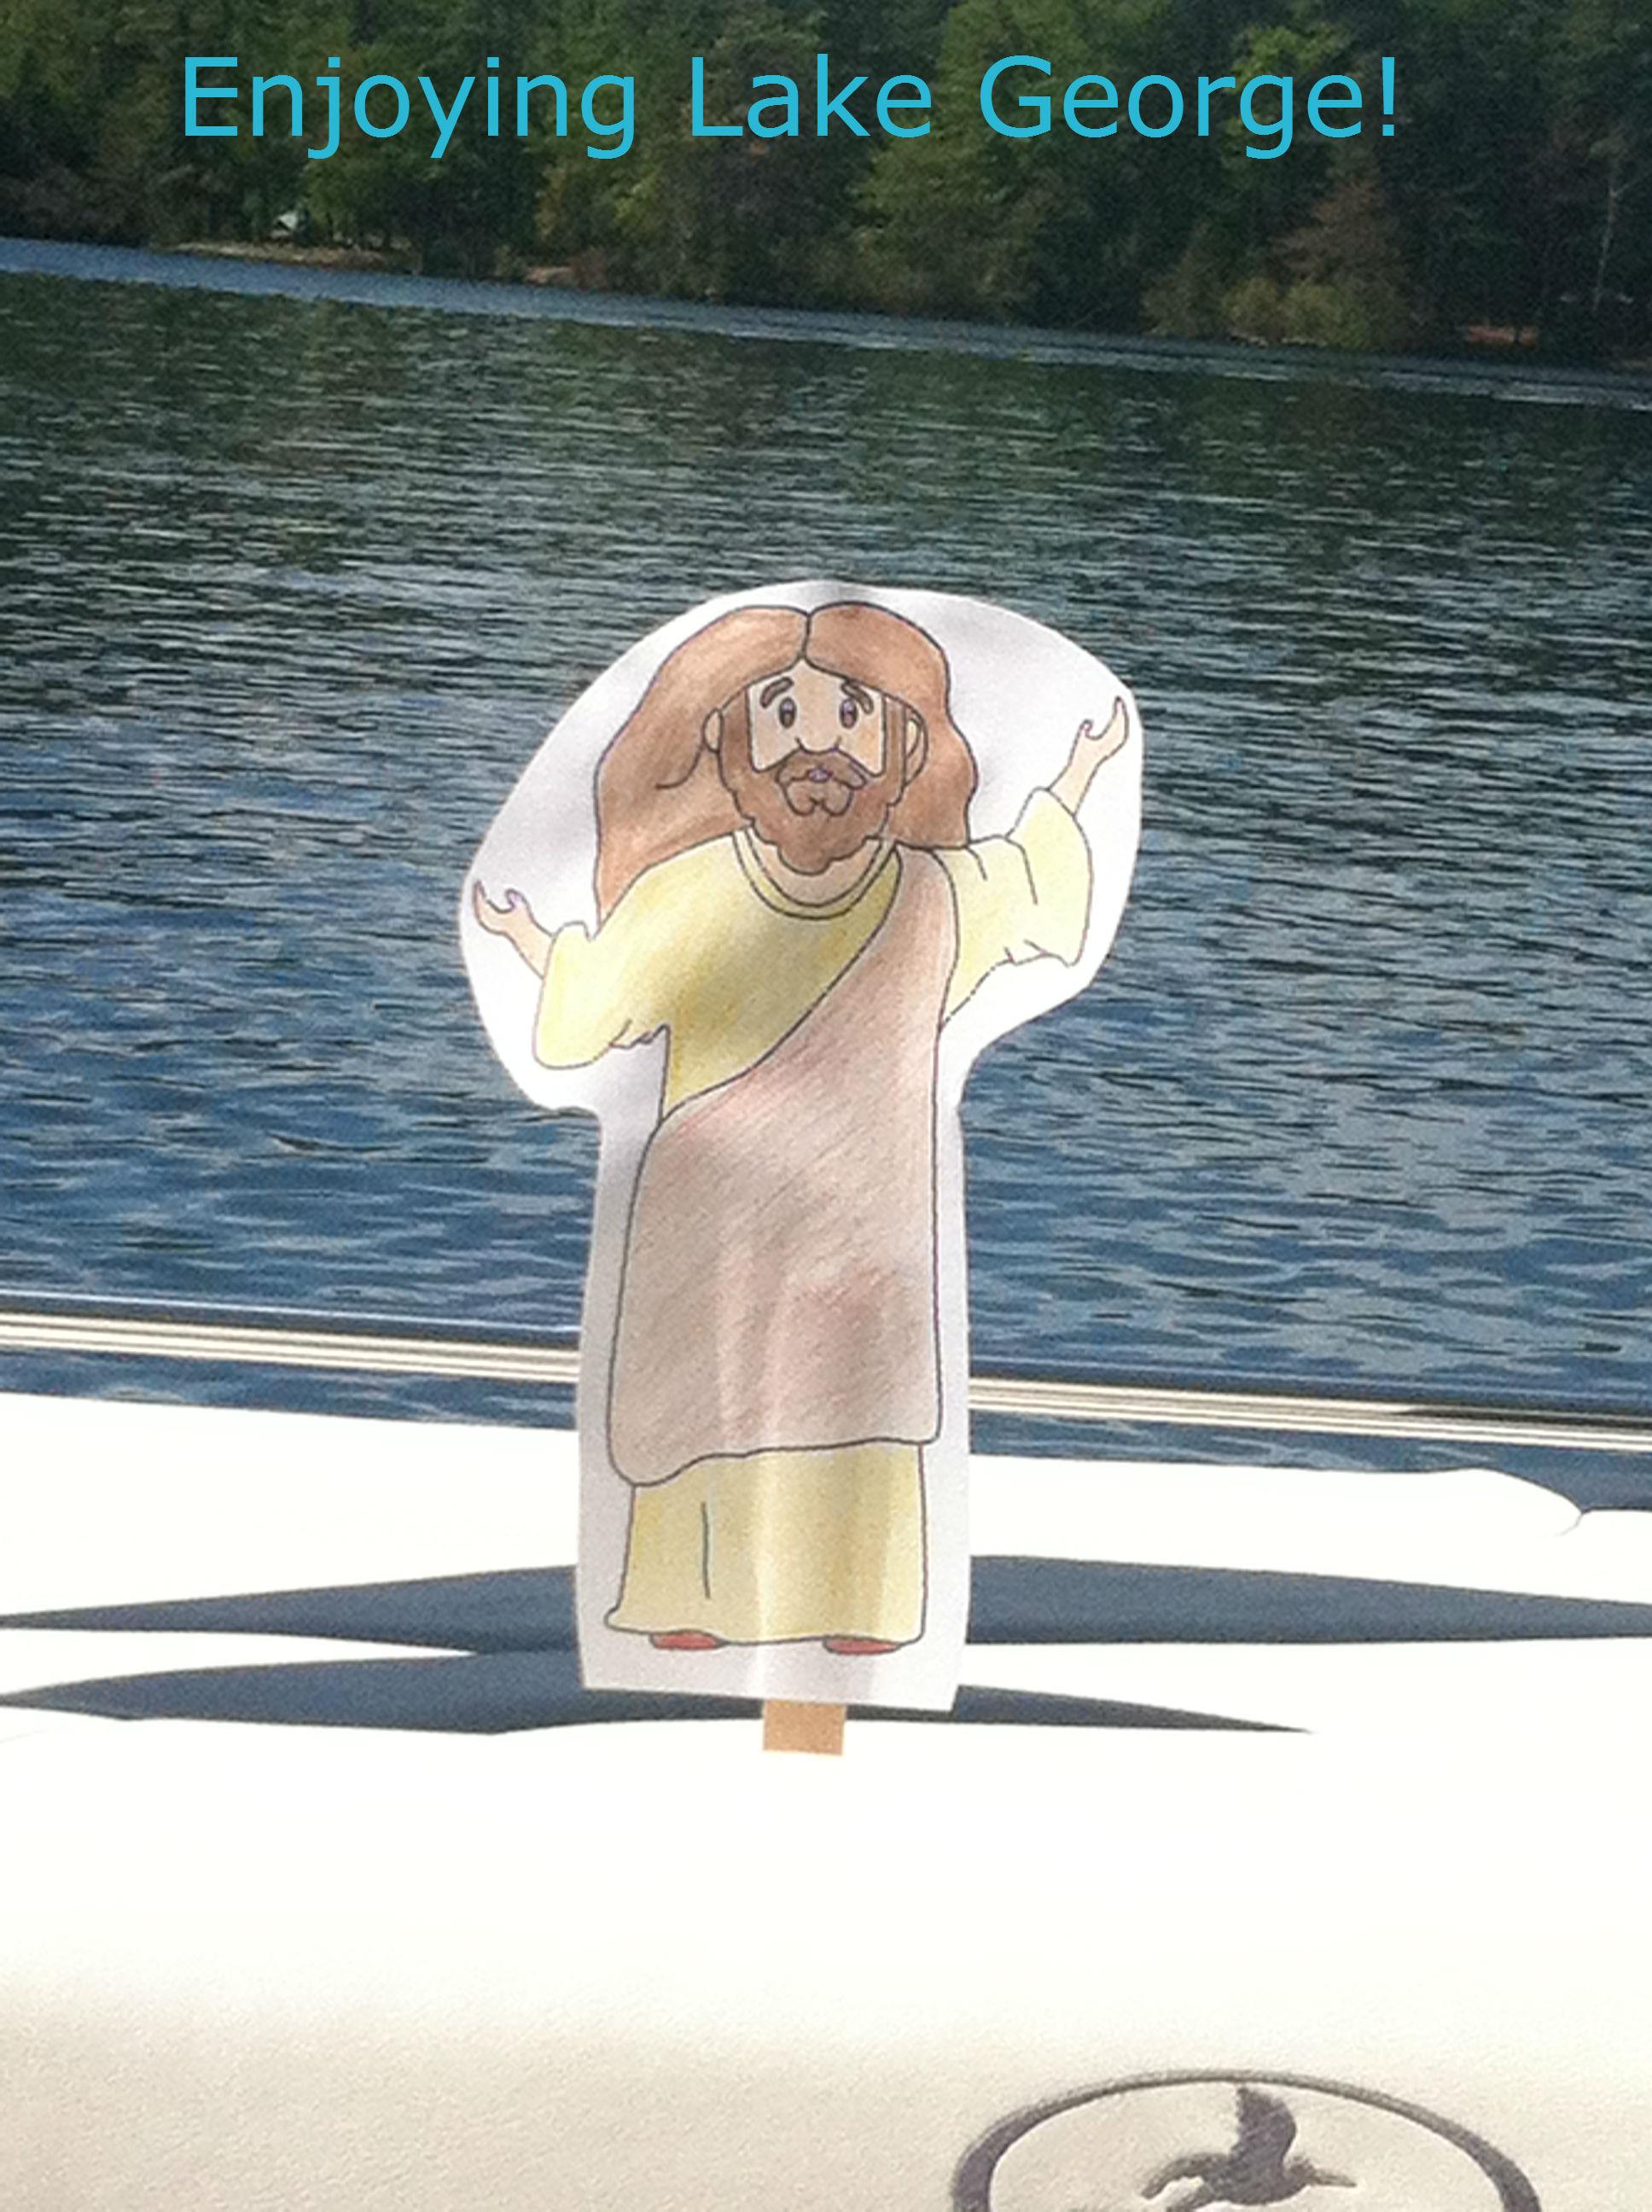 Jesus Lake George